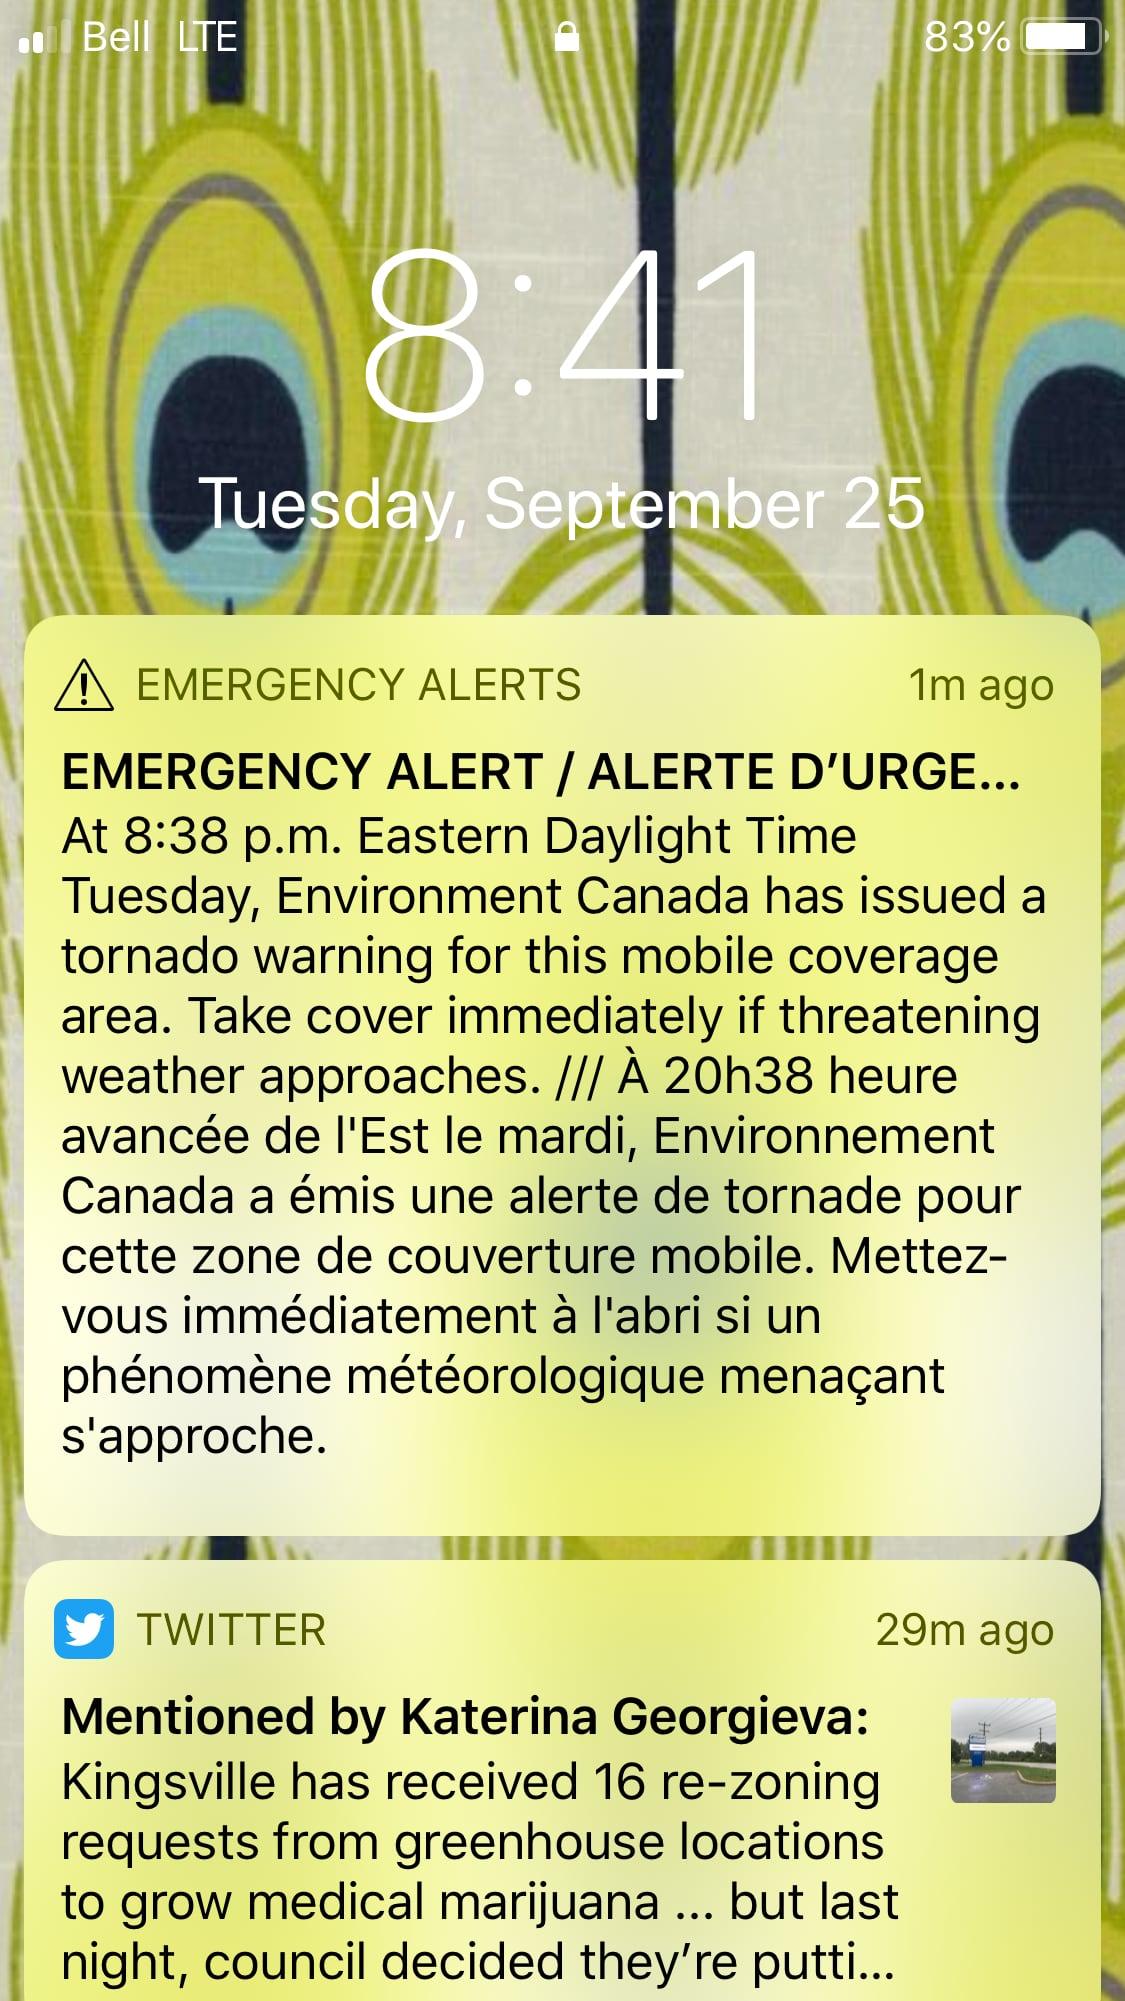 Tornado alert, fire alarm causes confusion at Windsor Walmart